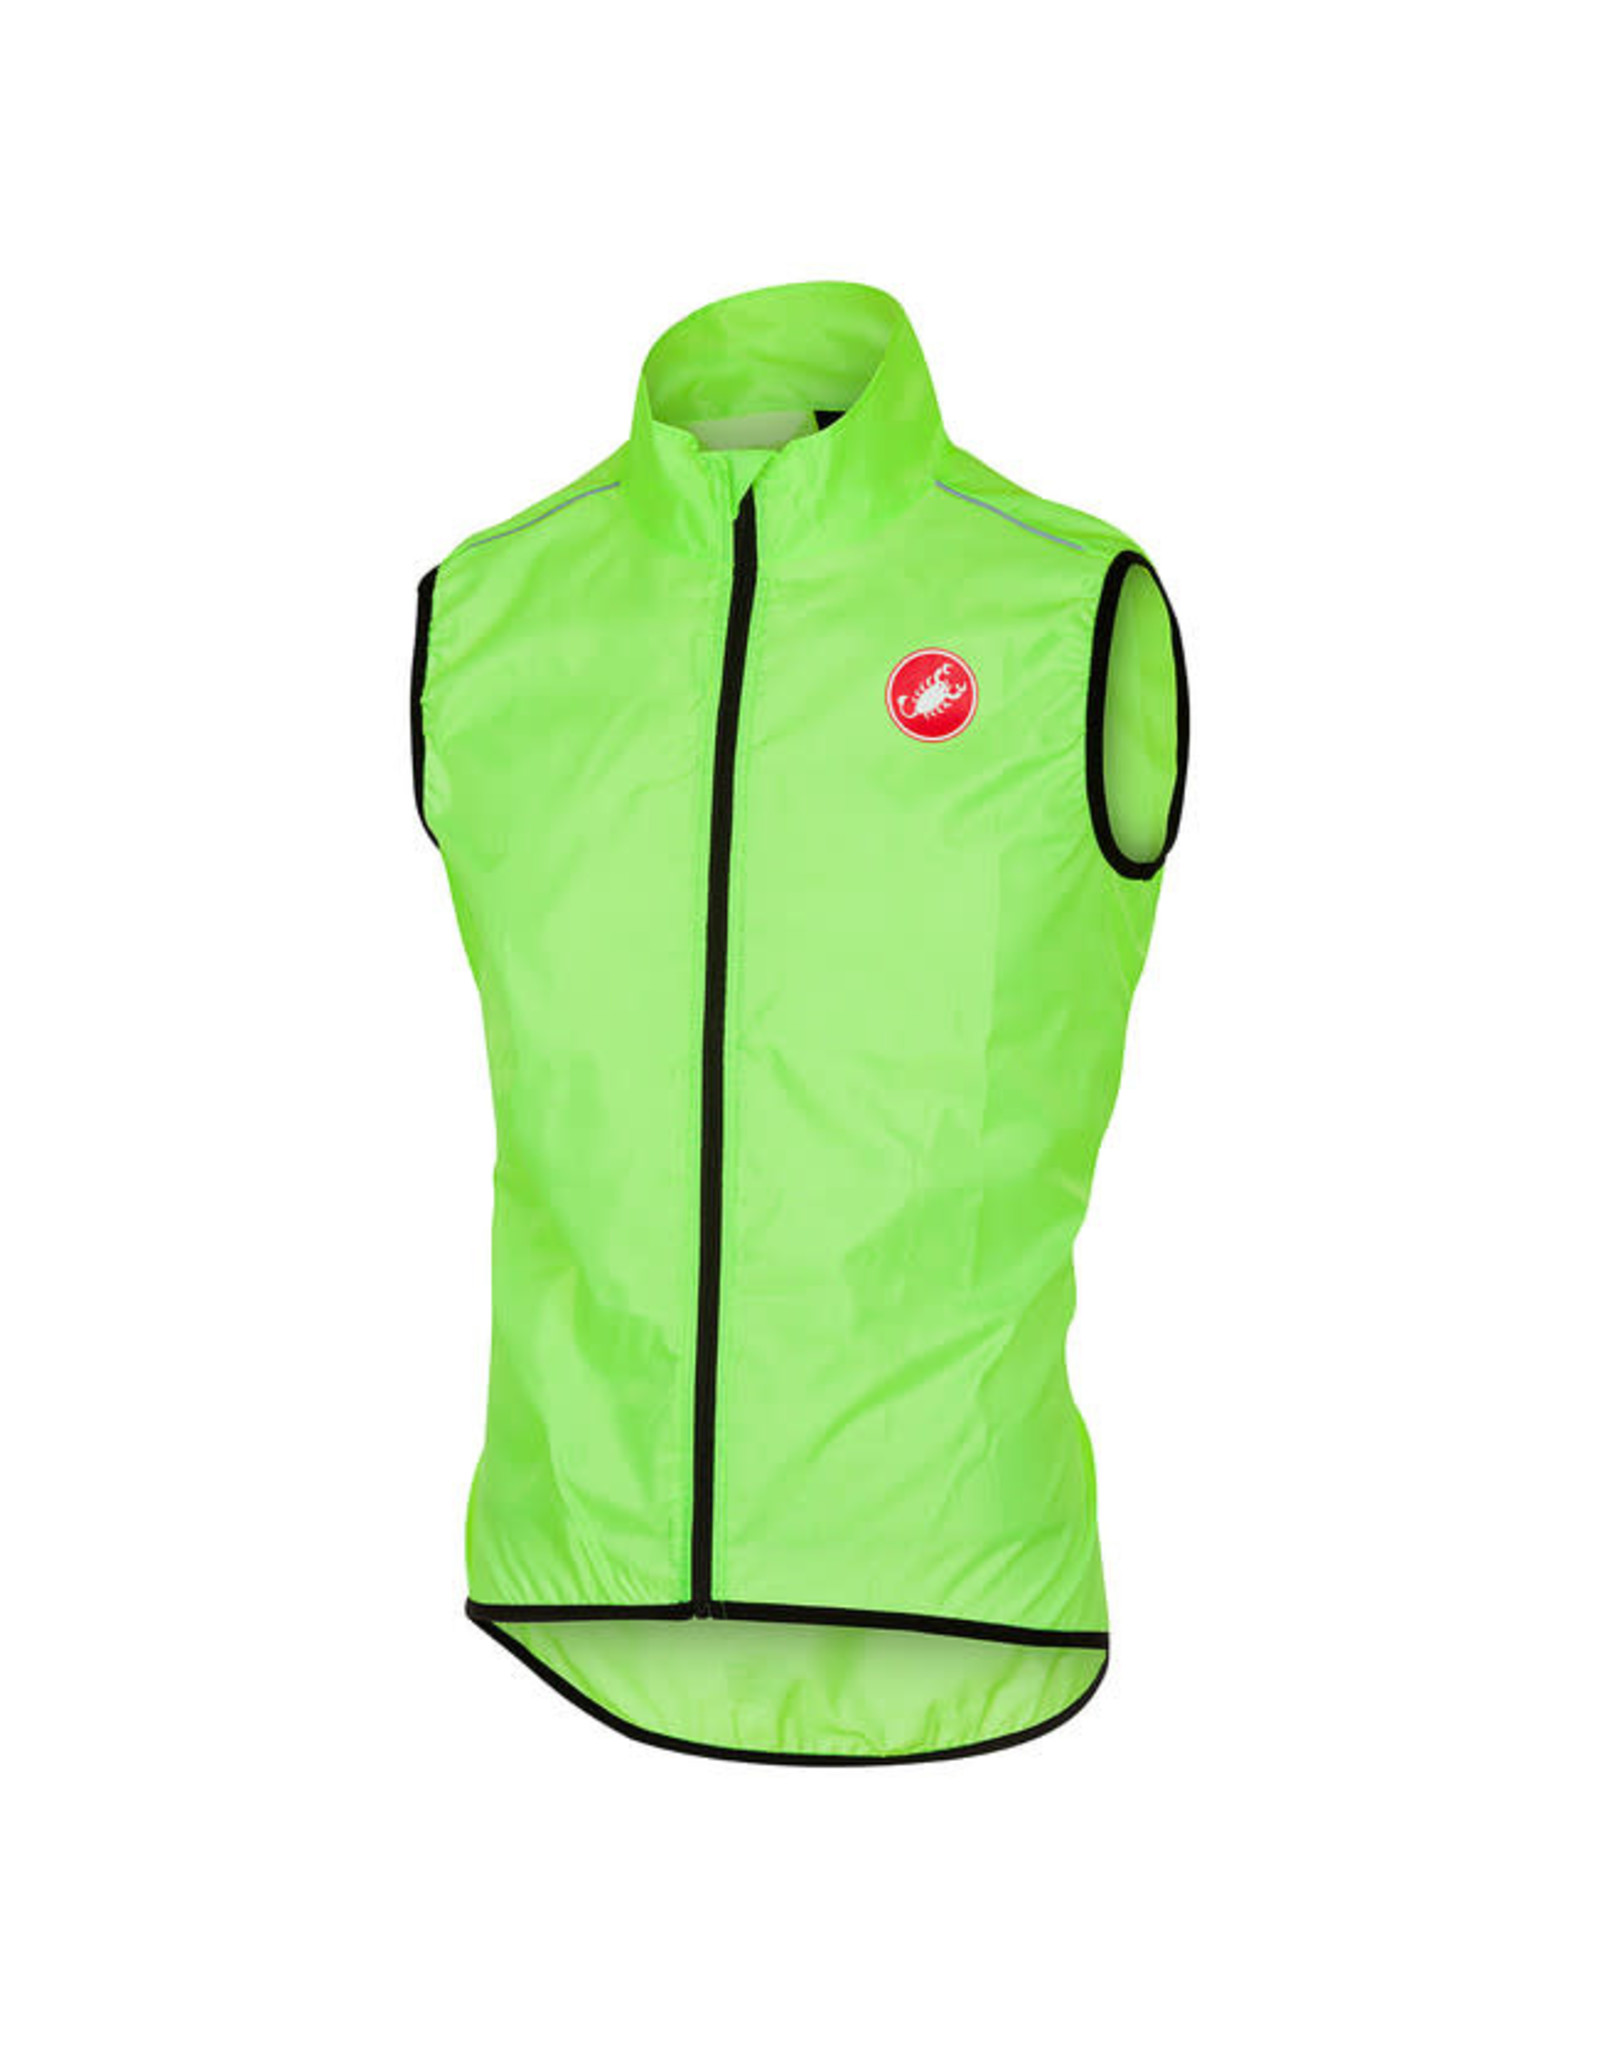 Castelli '20, CASTELLI, Squadra, Men's Vest